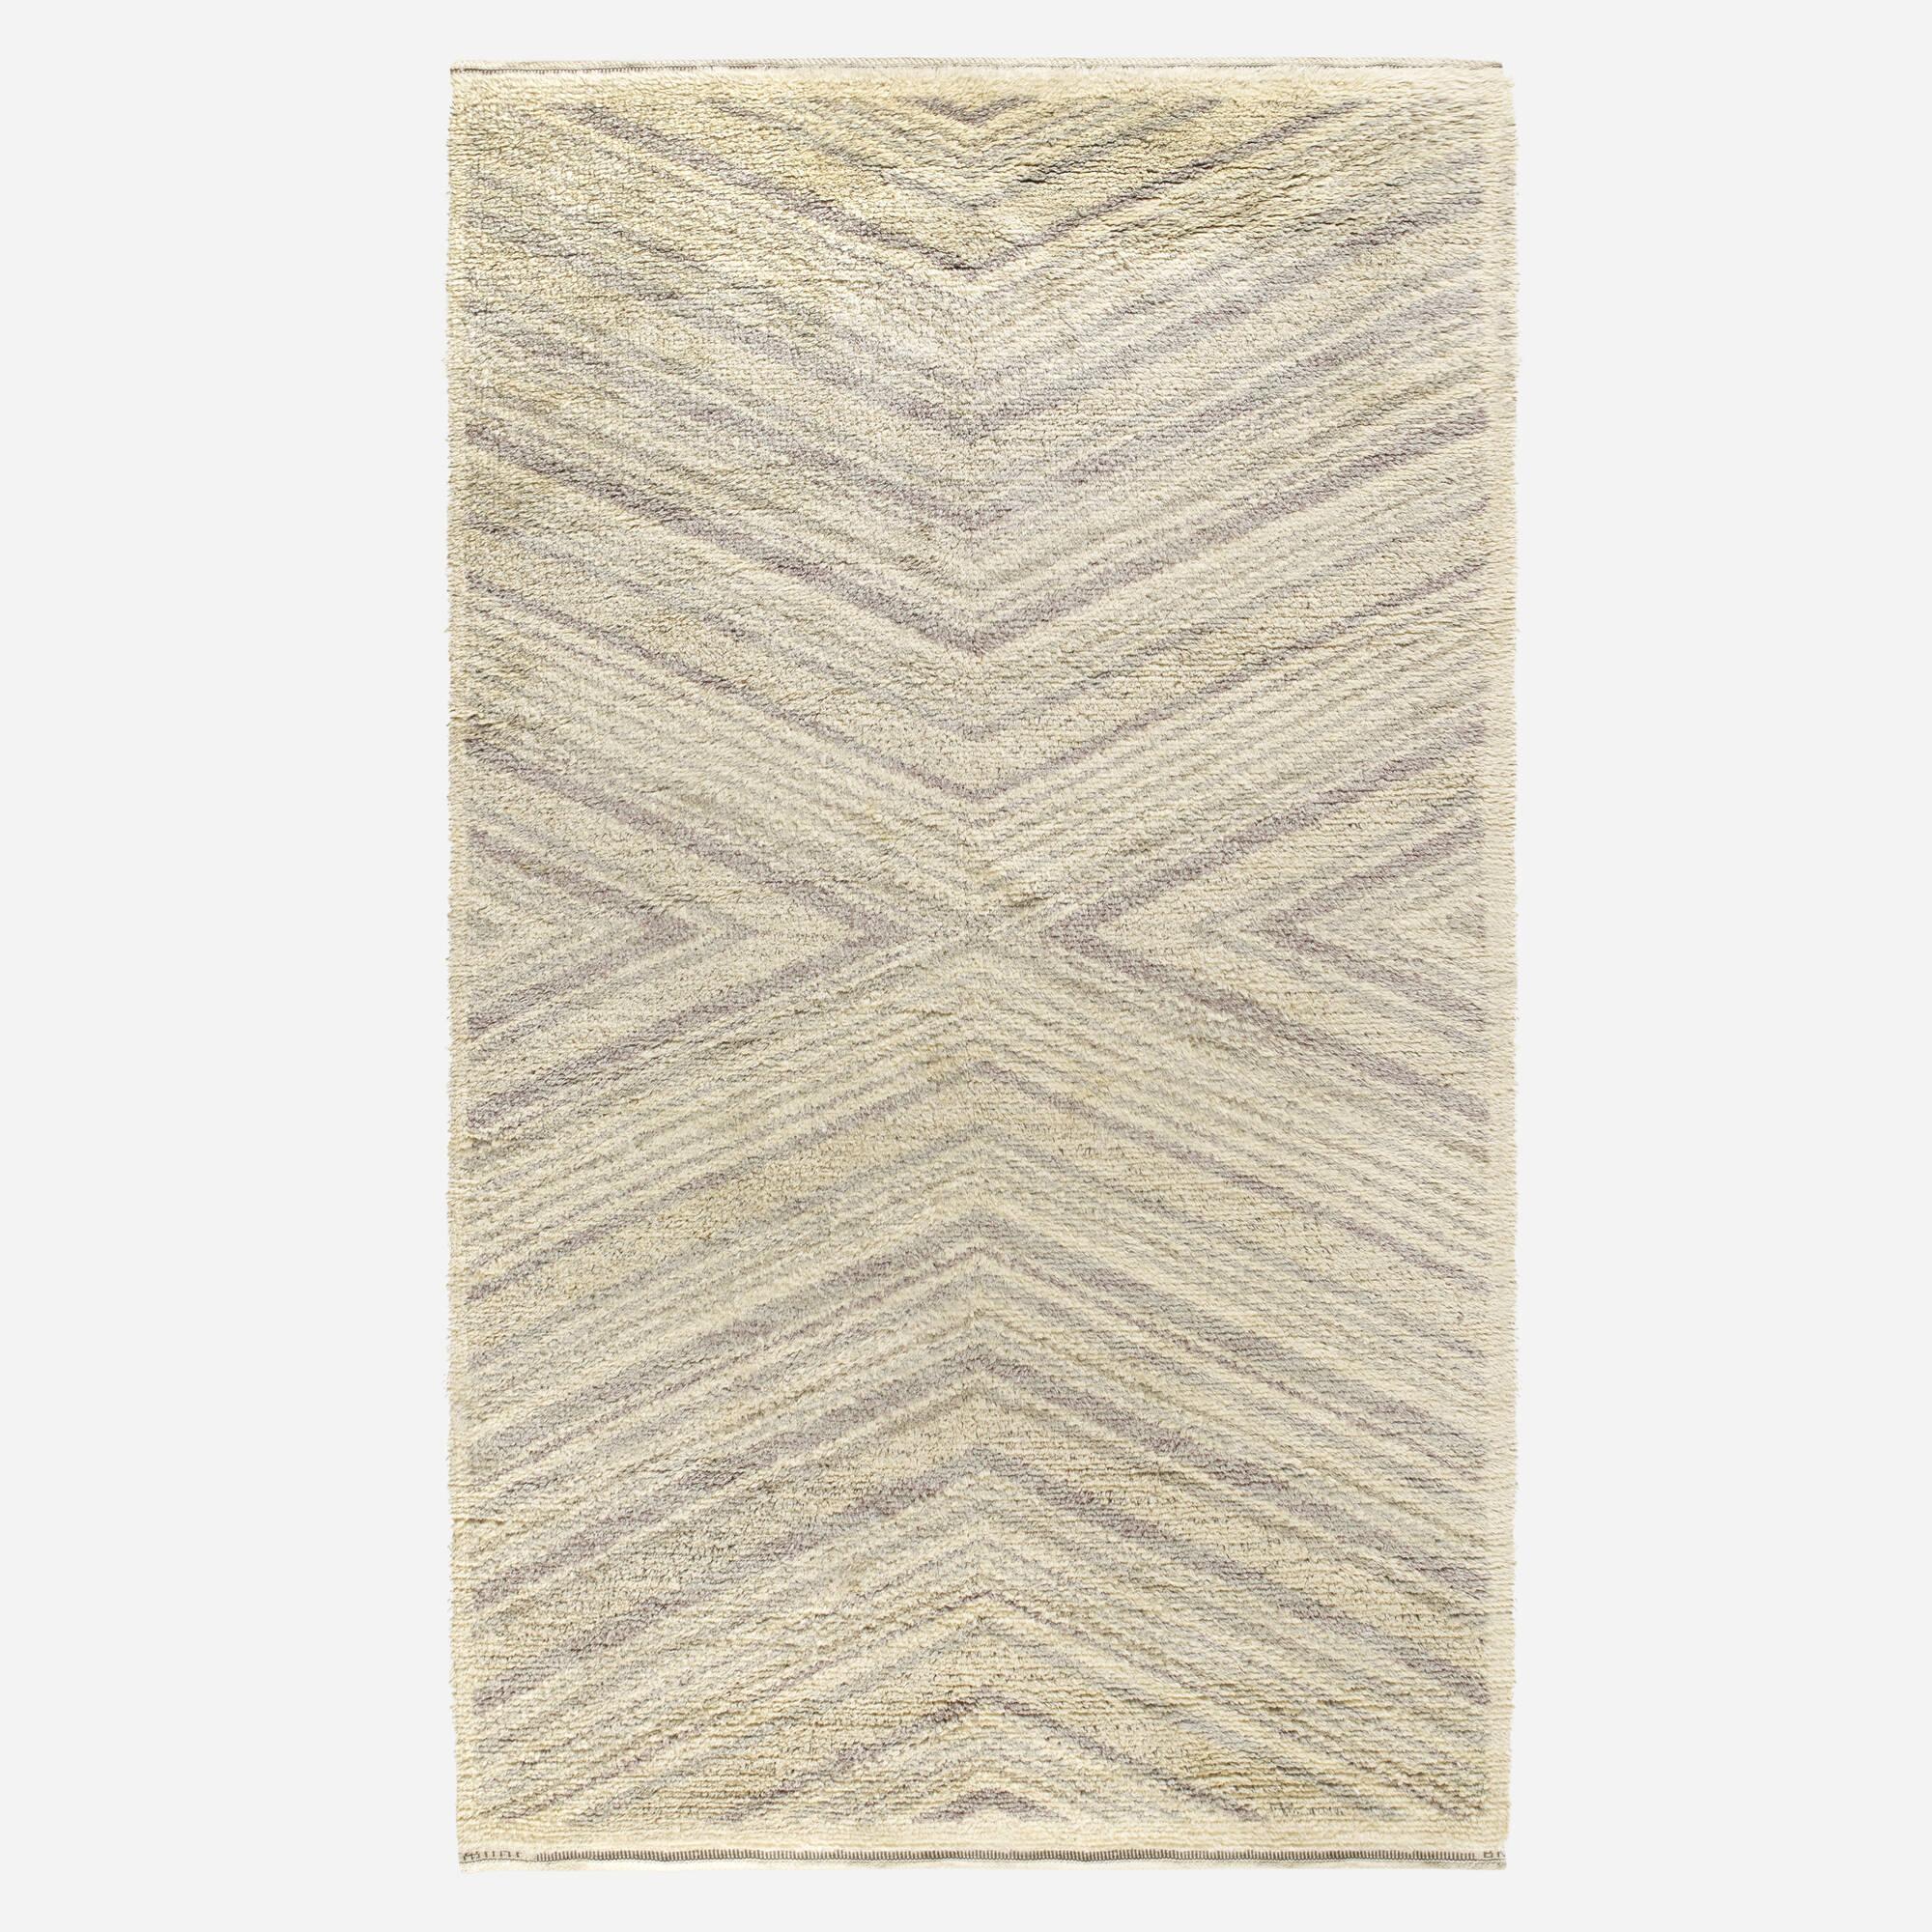 159: Barbro Nilsson / Tigerfällen rya carpet (1 of 2)